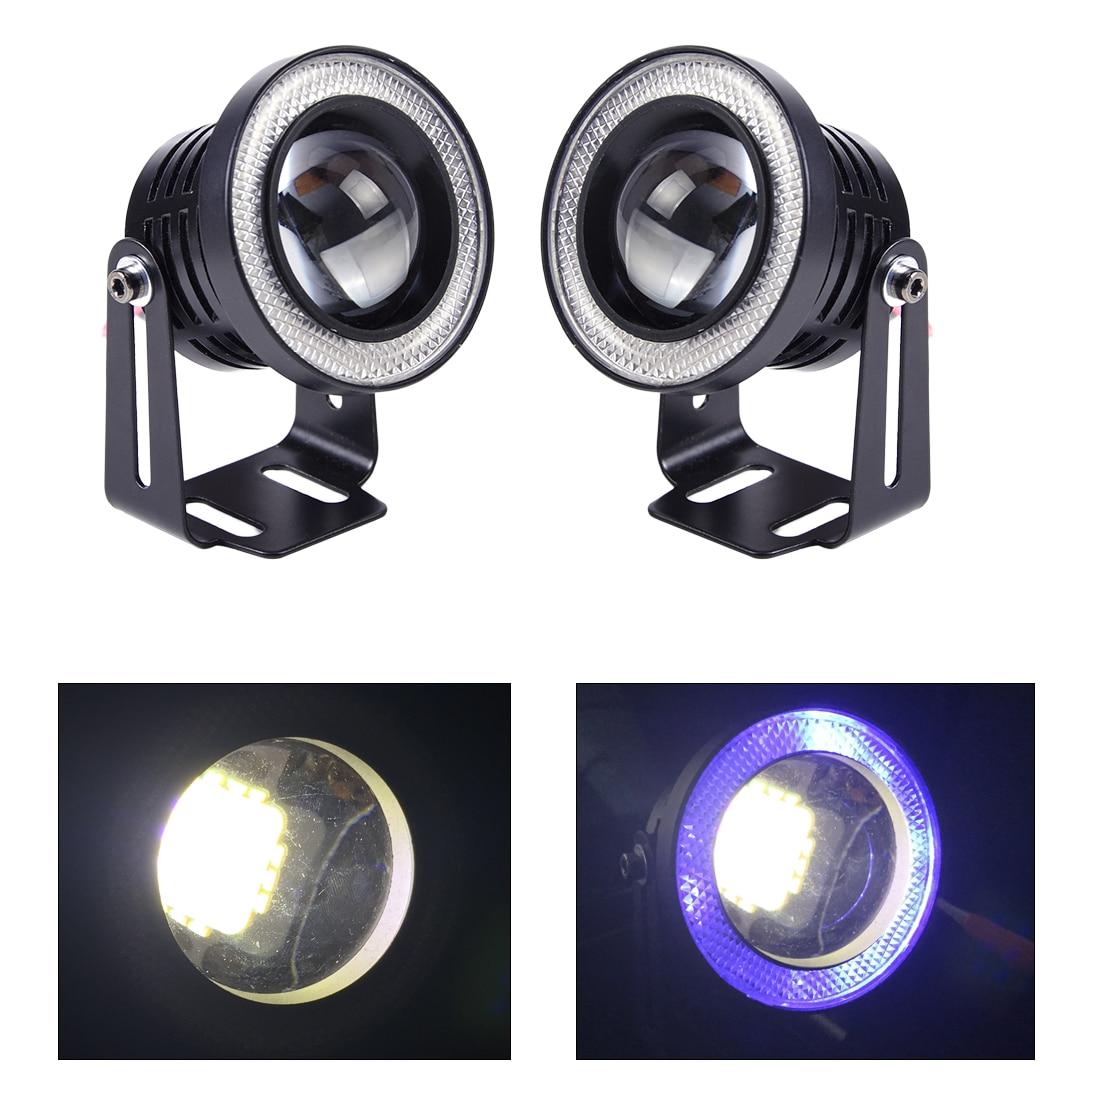 beler 12V 2.5 10W White LED Projector Fog Lens DRL Driving Light with Blue LED Angel Eye Halo Ring for VW Audi Ford Toyota